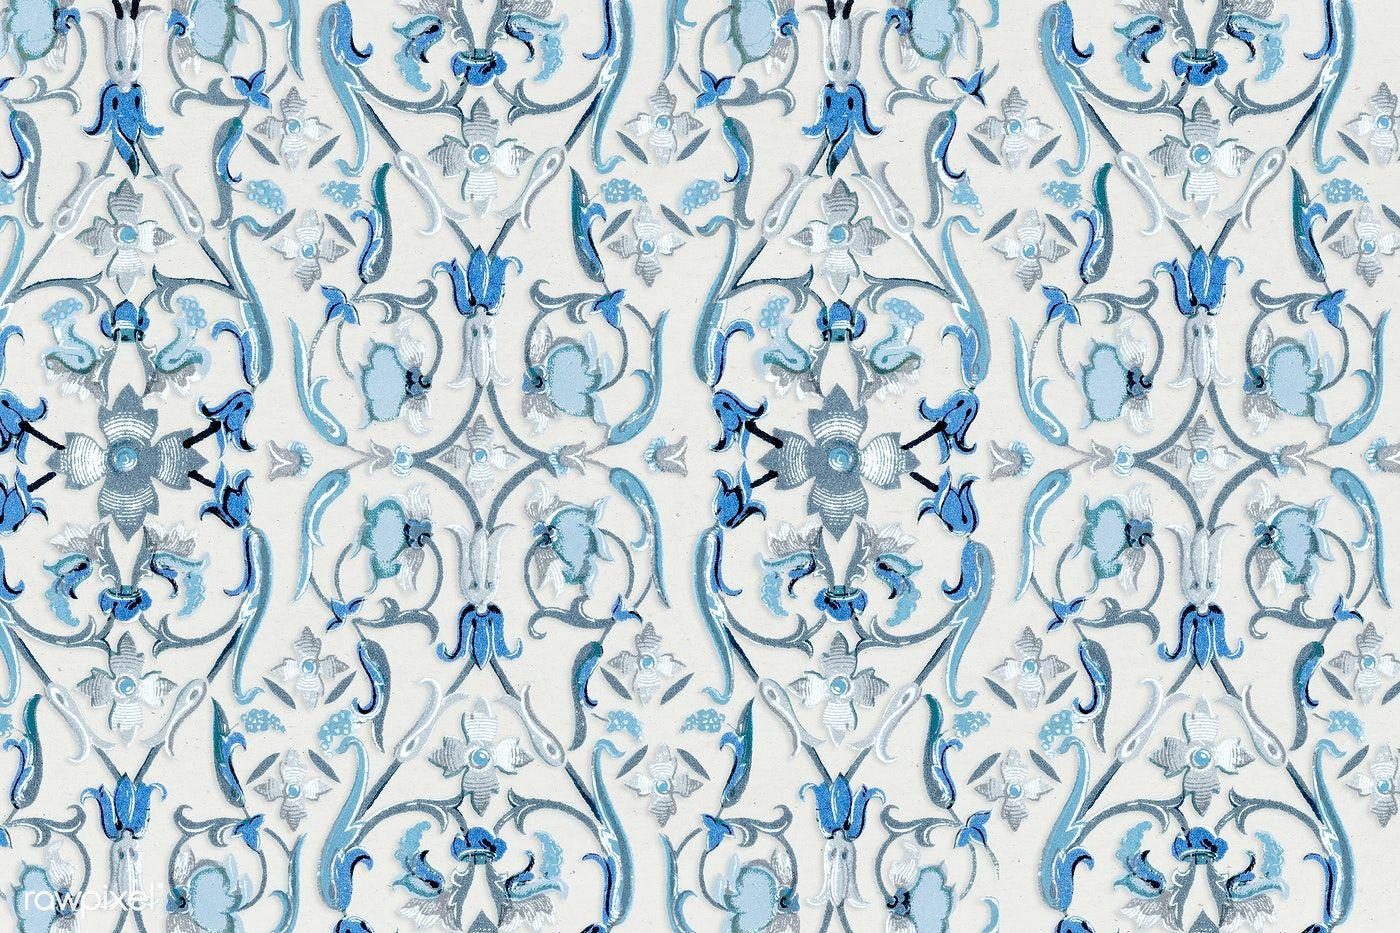 Watercolor Blue Floral Bouquet Watercolor Clipart Wreath Illustration Png Transparent Clipart Image And Psd File For Free Download Abstrak Kartu Pernikahan Kartu